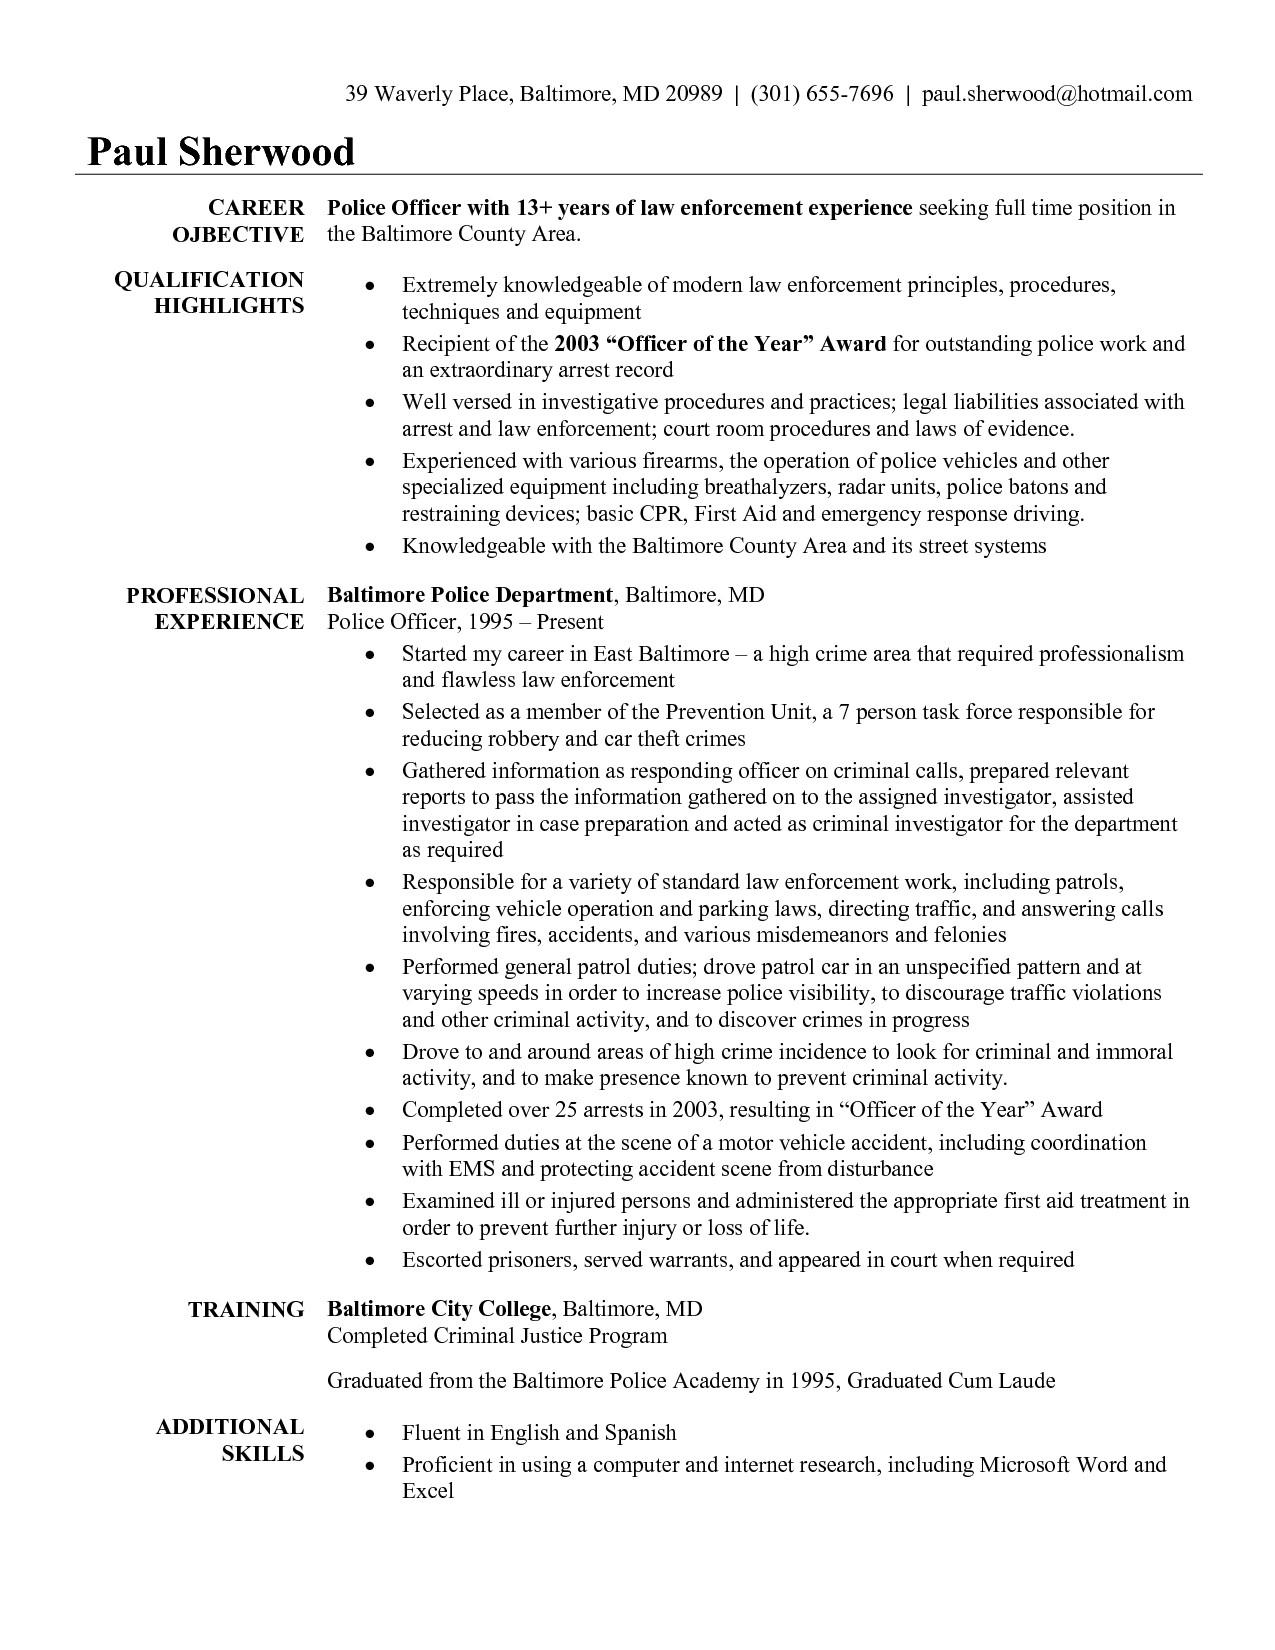 Police Officer Cover Letter Template - Sample Resume for Police Ficer Police Ficer Cover Letter No